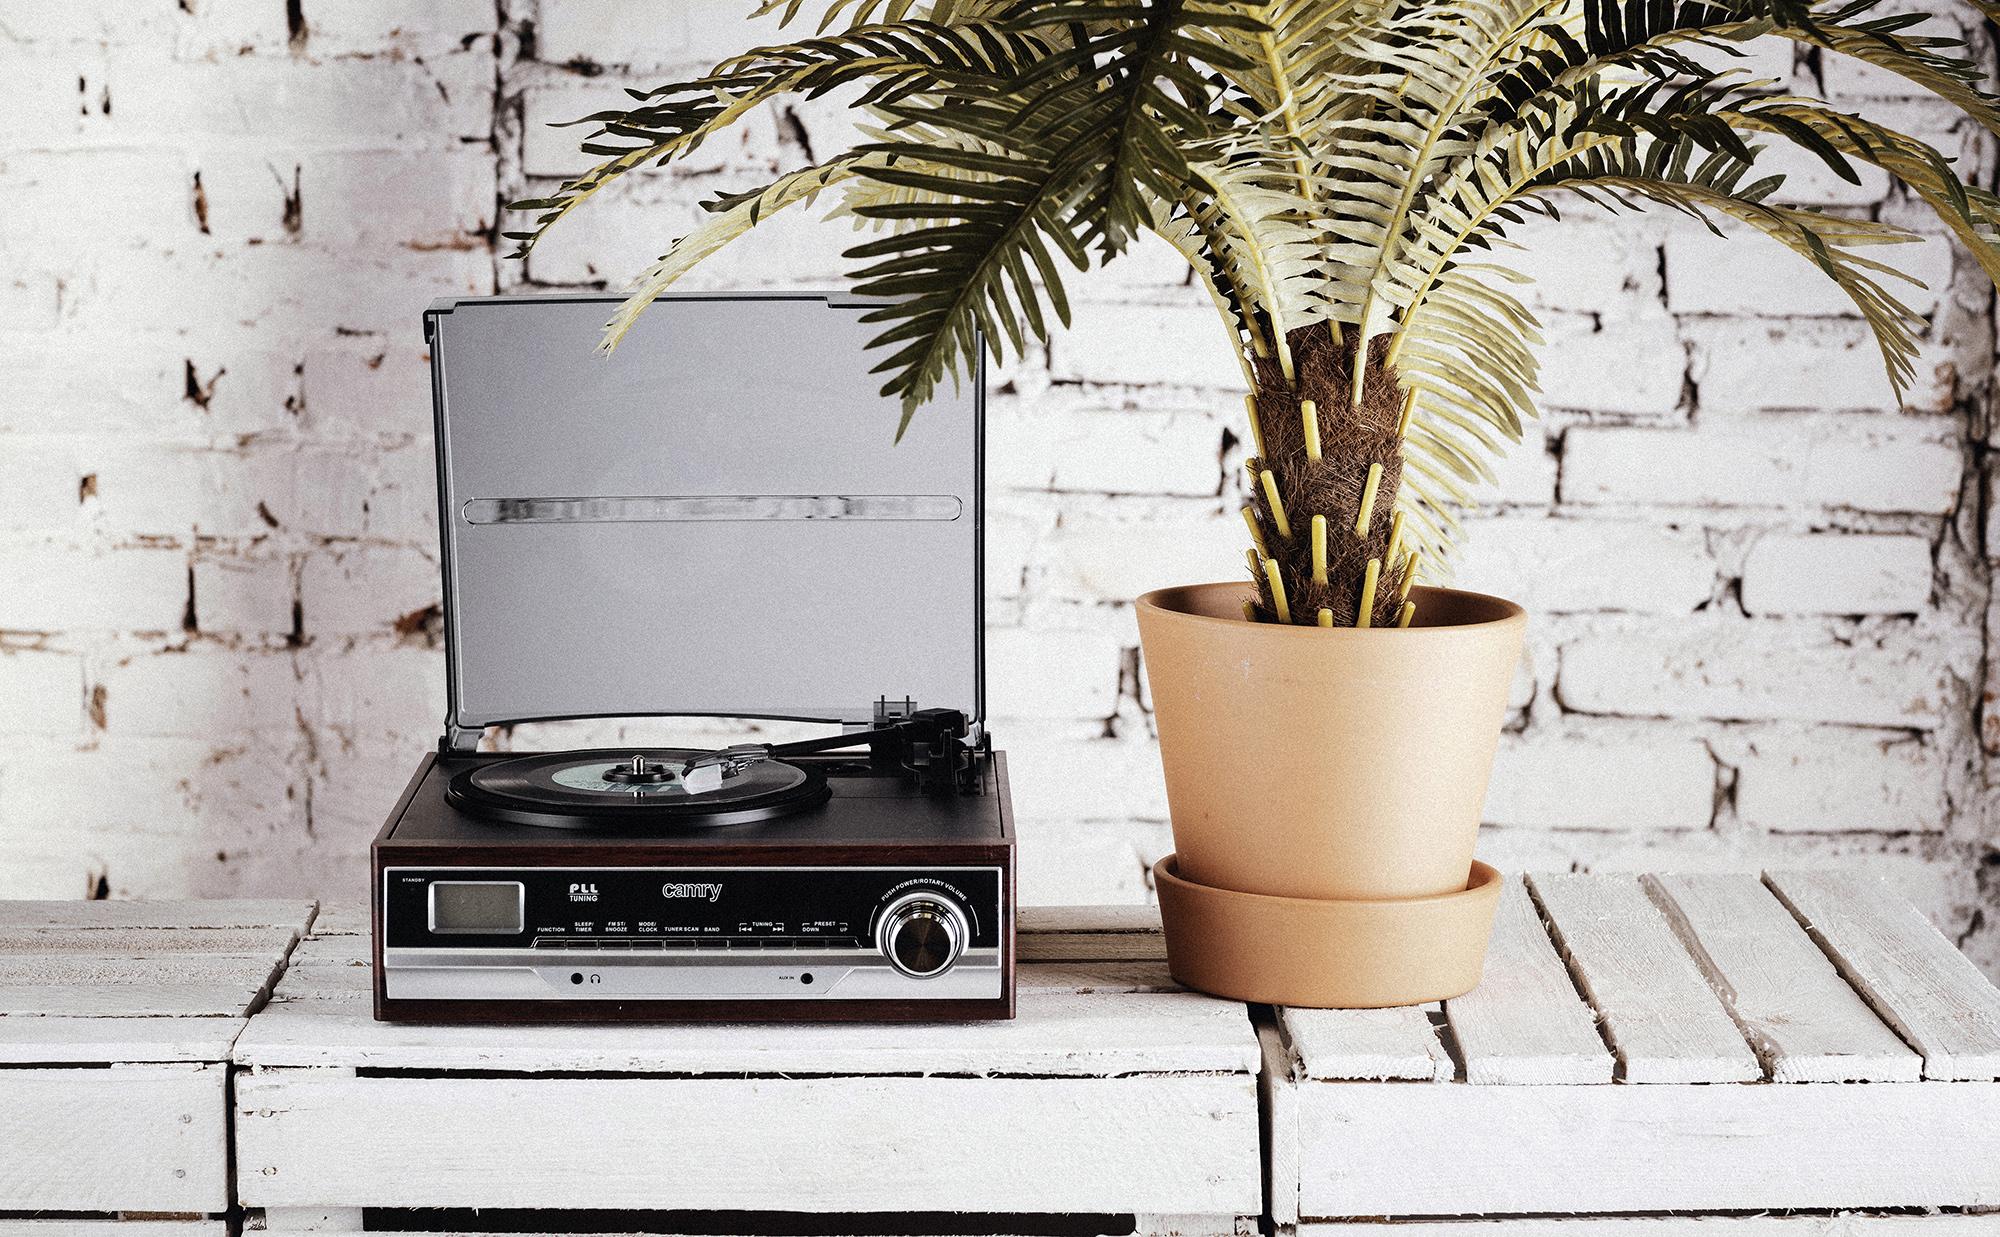 CAMRY CR1113 Tocadiscos Retro 33-45-78 RPM, Radio AM-FM, Estéreo, Despertador, Estilo Vintage, AUX 3,5 mm, Despertador, Pantalla LCD